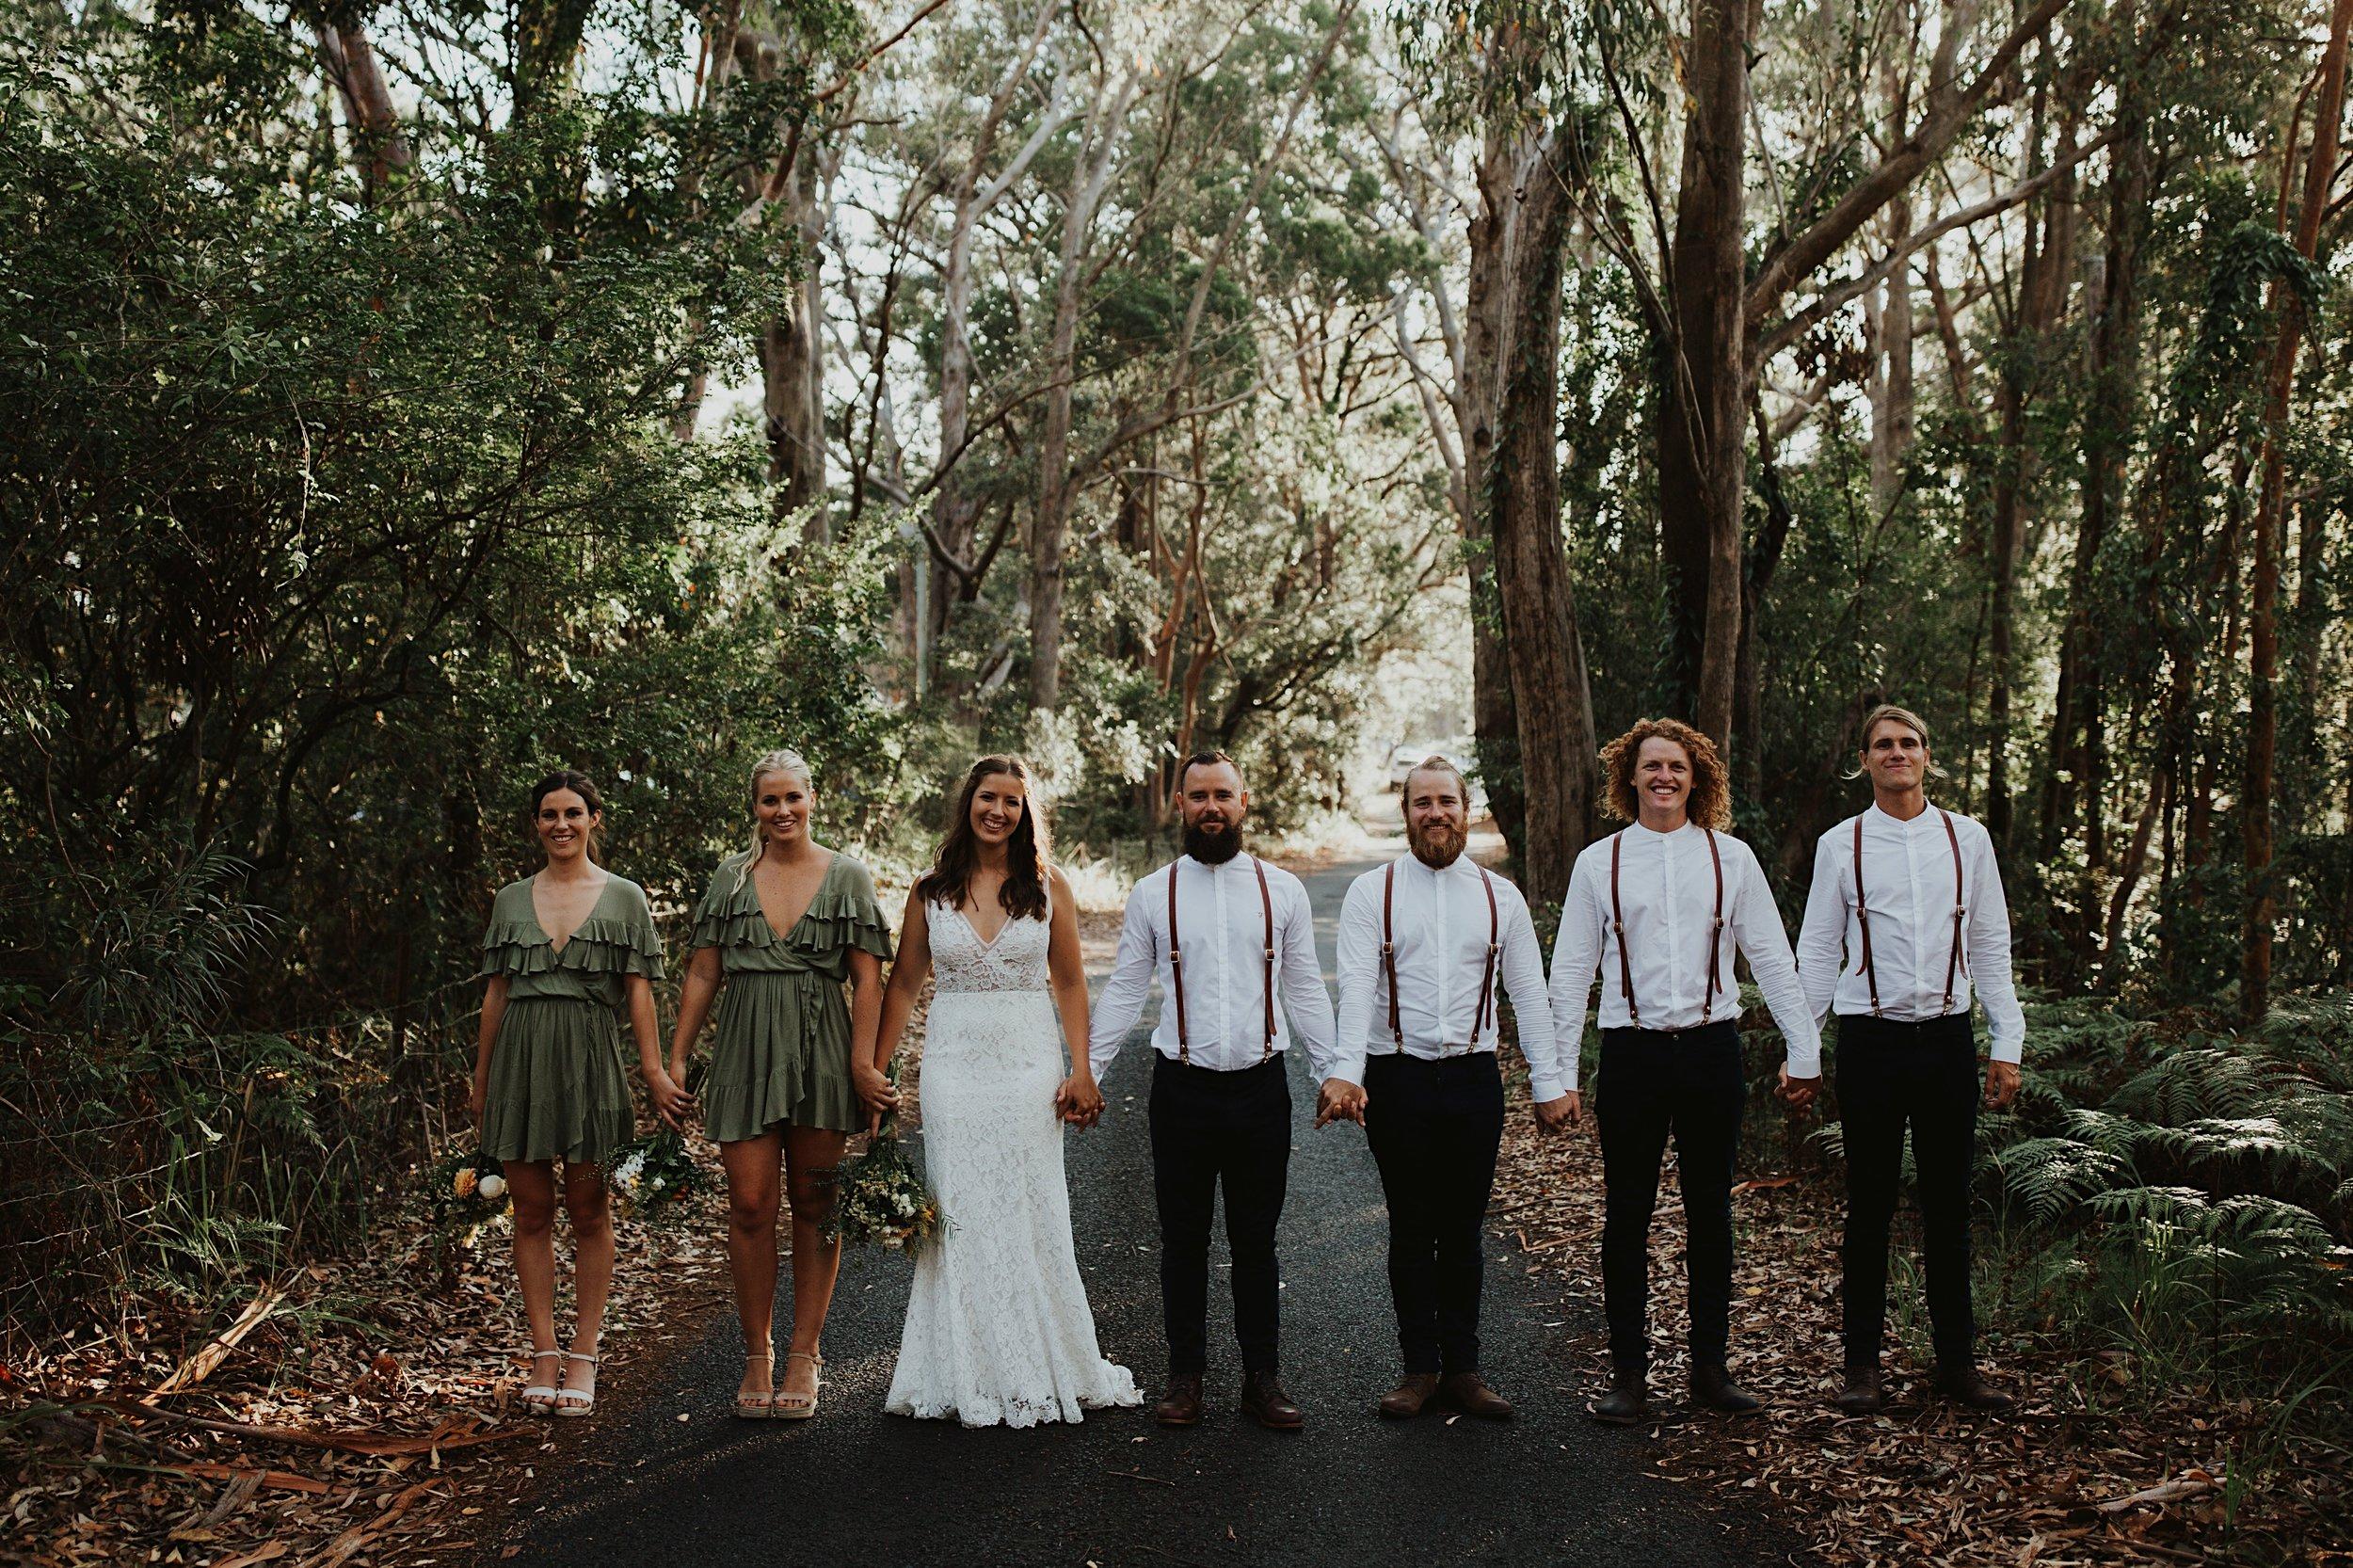 AustraliaweddingTom 0092.jpg